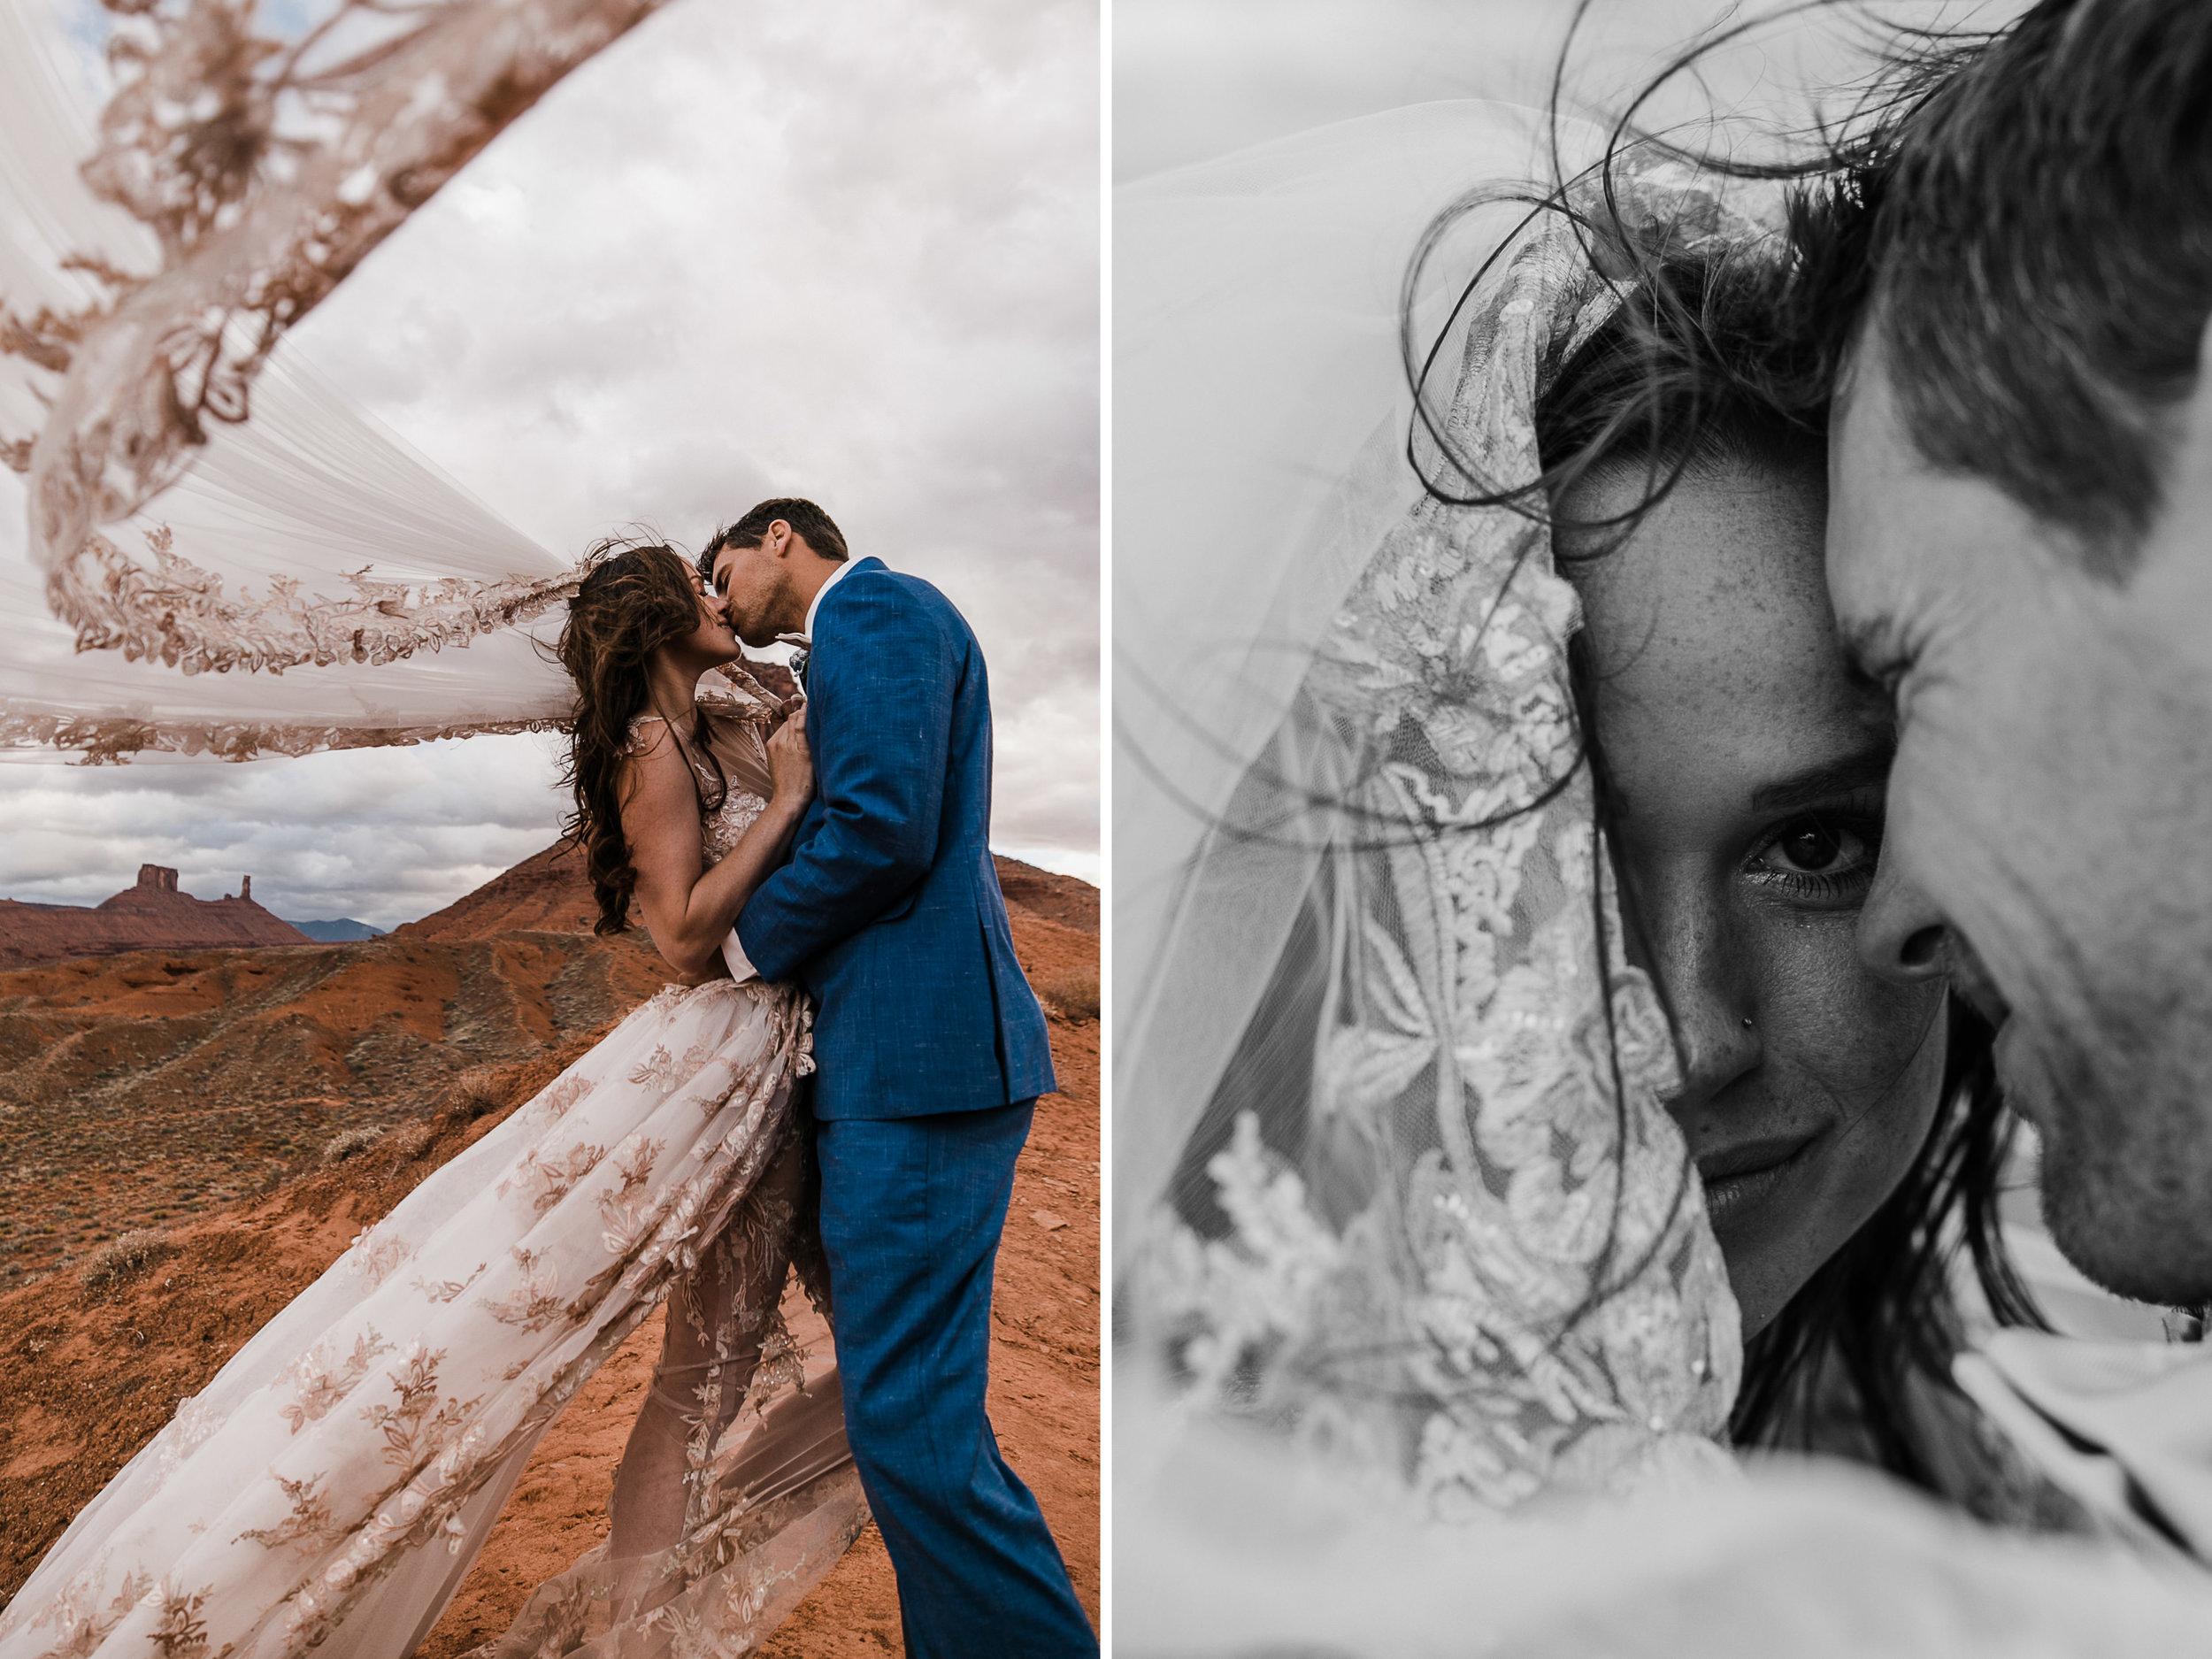 adventure elopement in moab, utah | destination adventure wedding photographers | the hearnes adventure photography | www.thehearnes.com